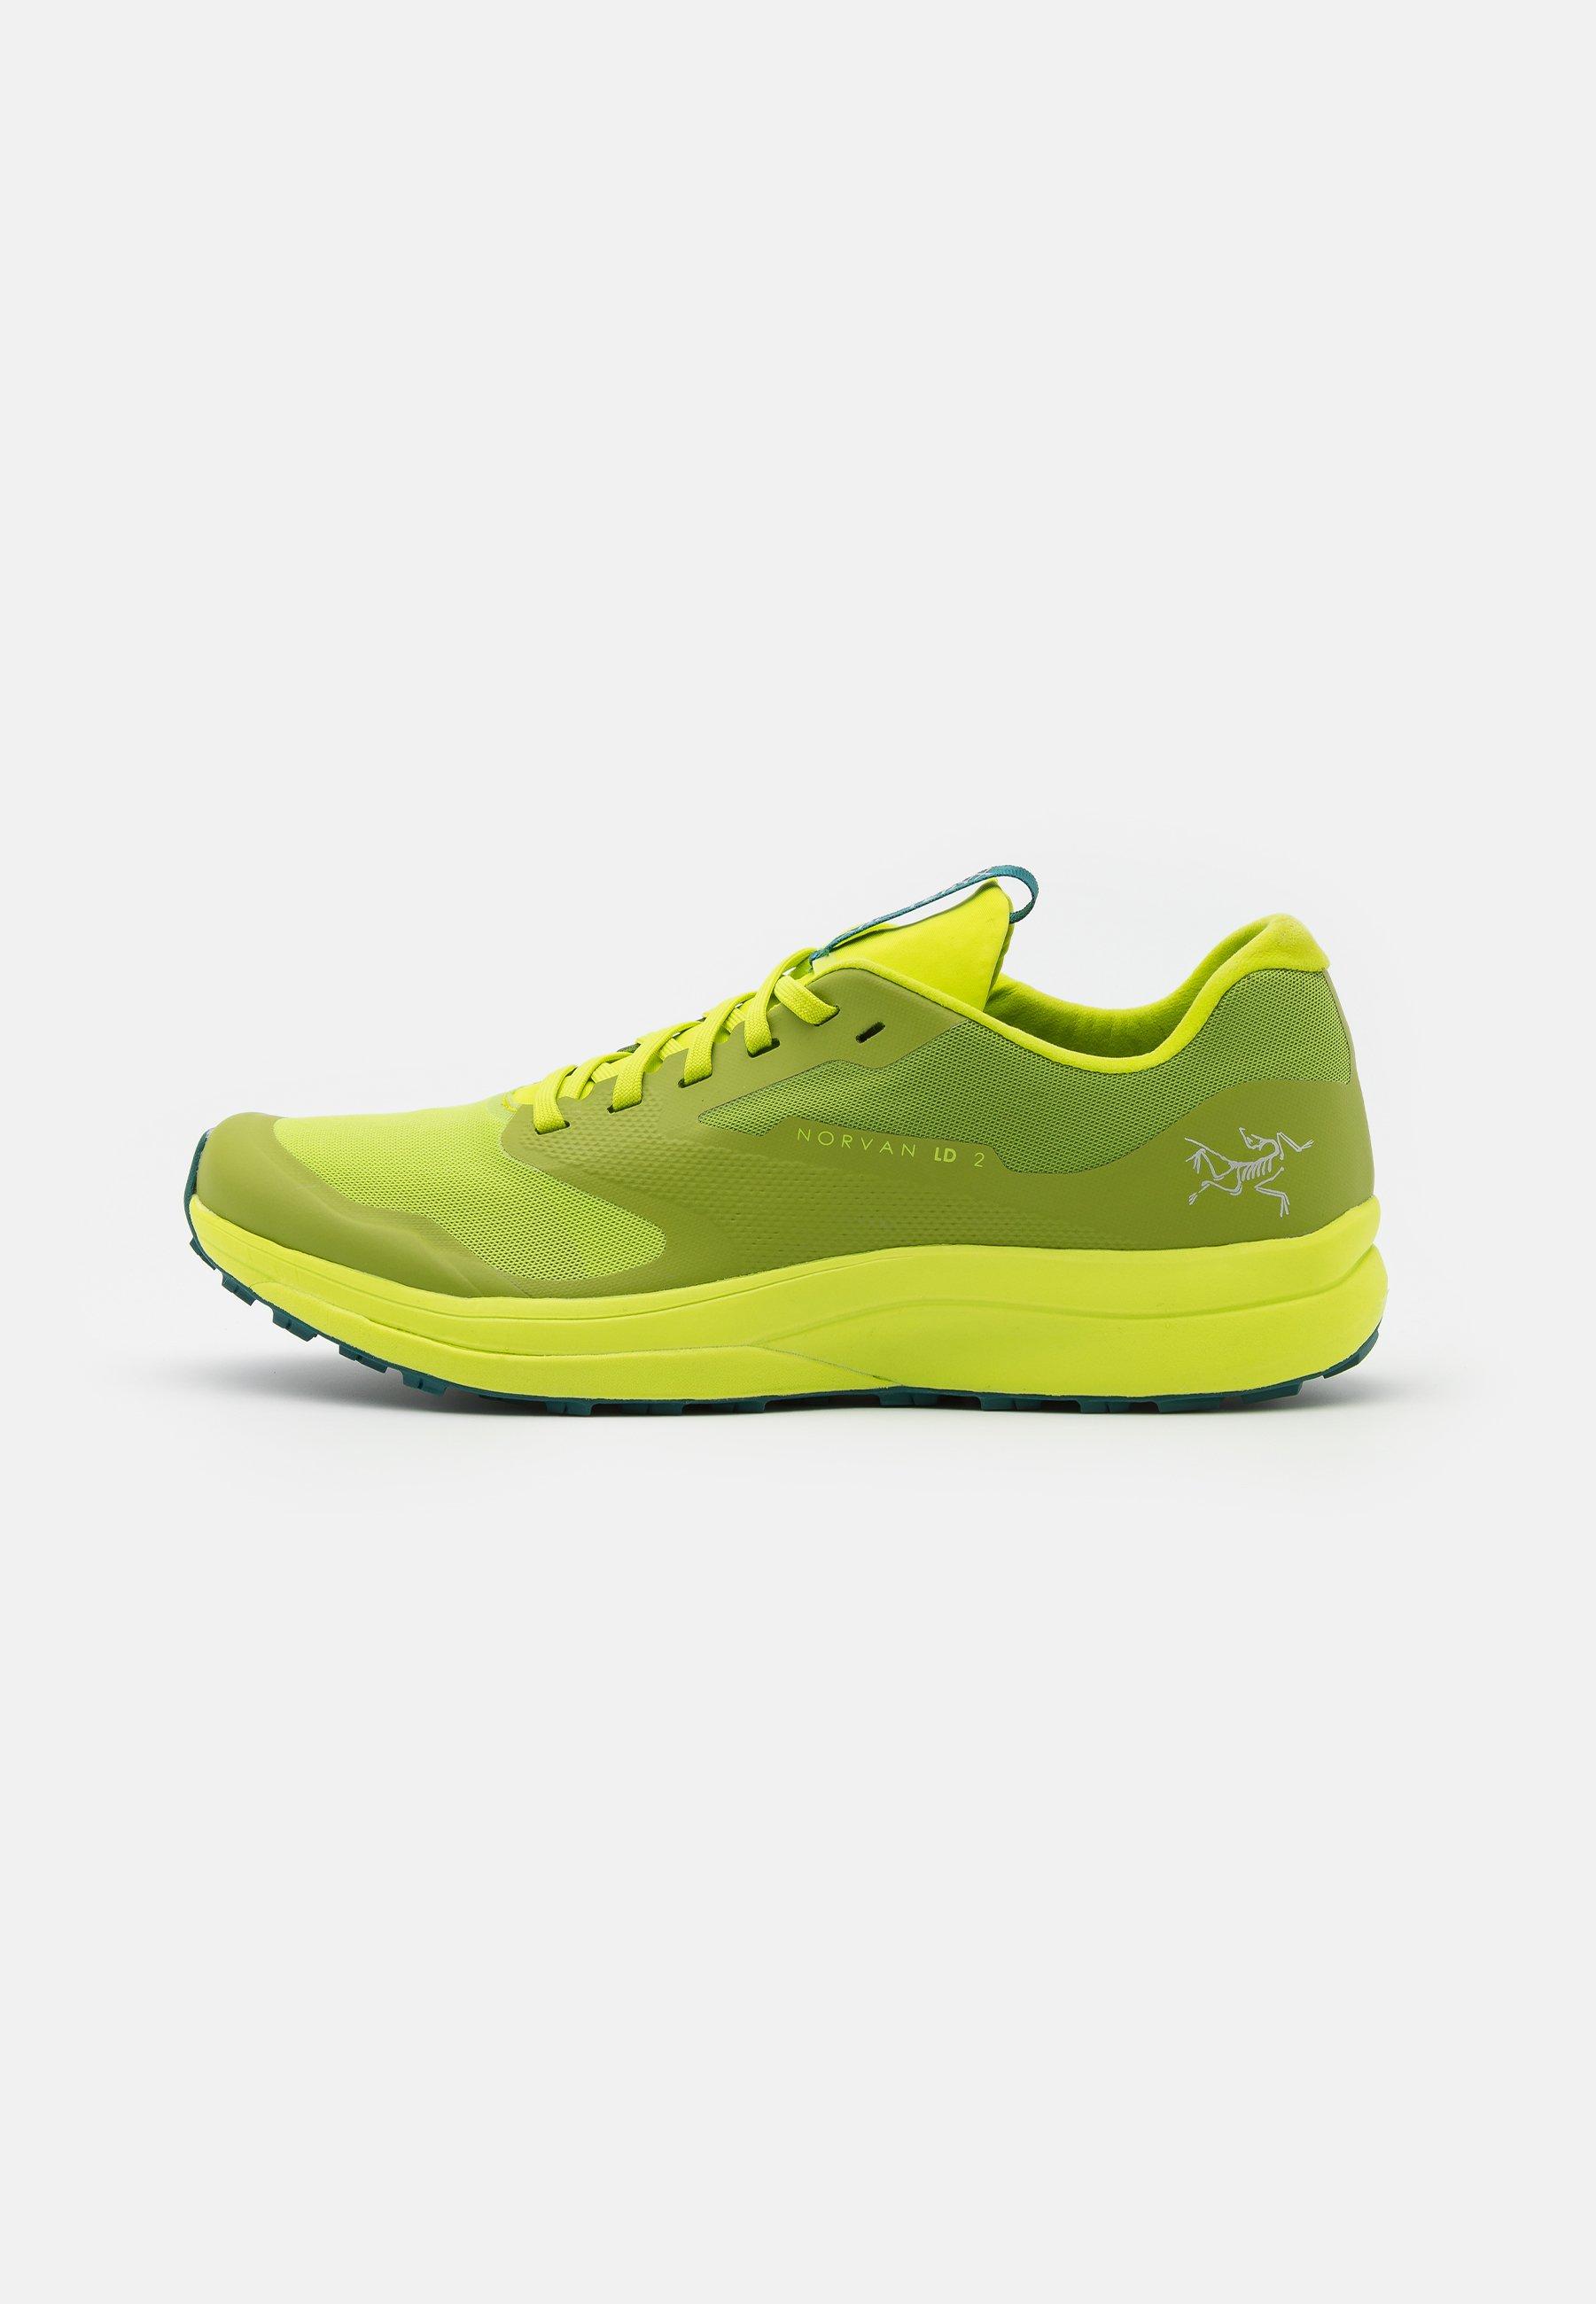 Men NORVAN LD 2 M - Trail running shoes